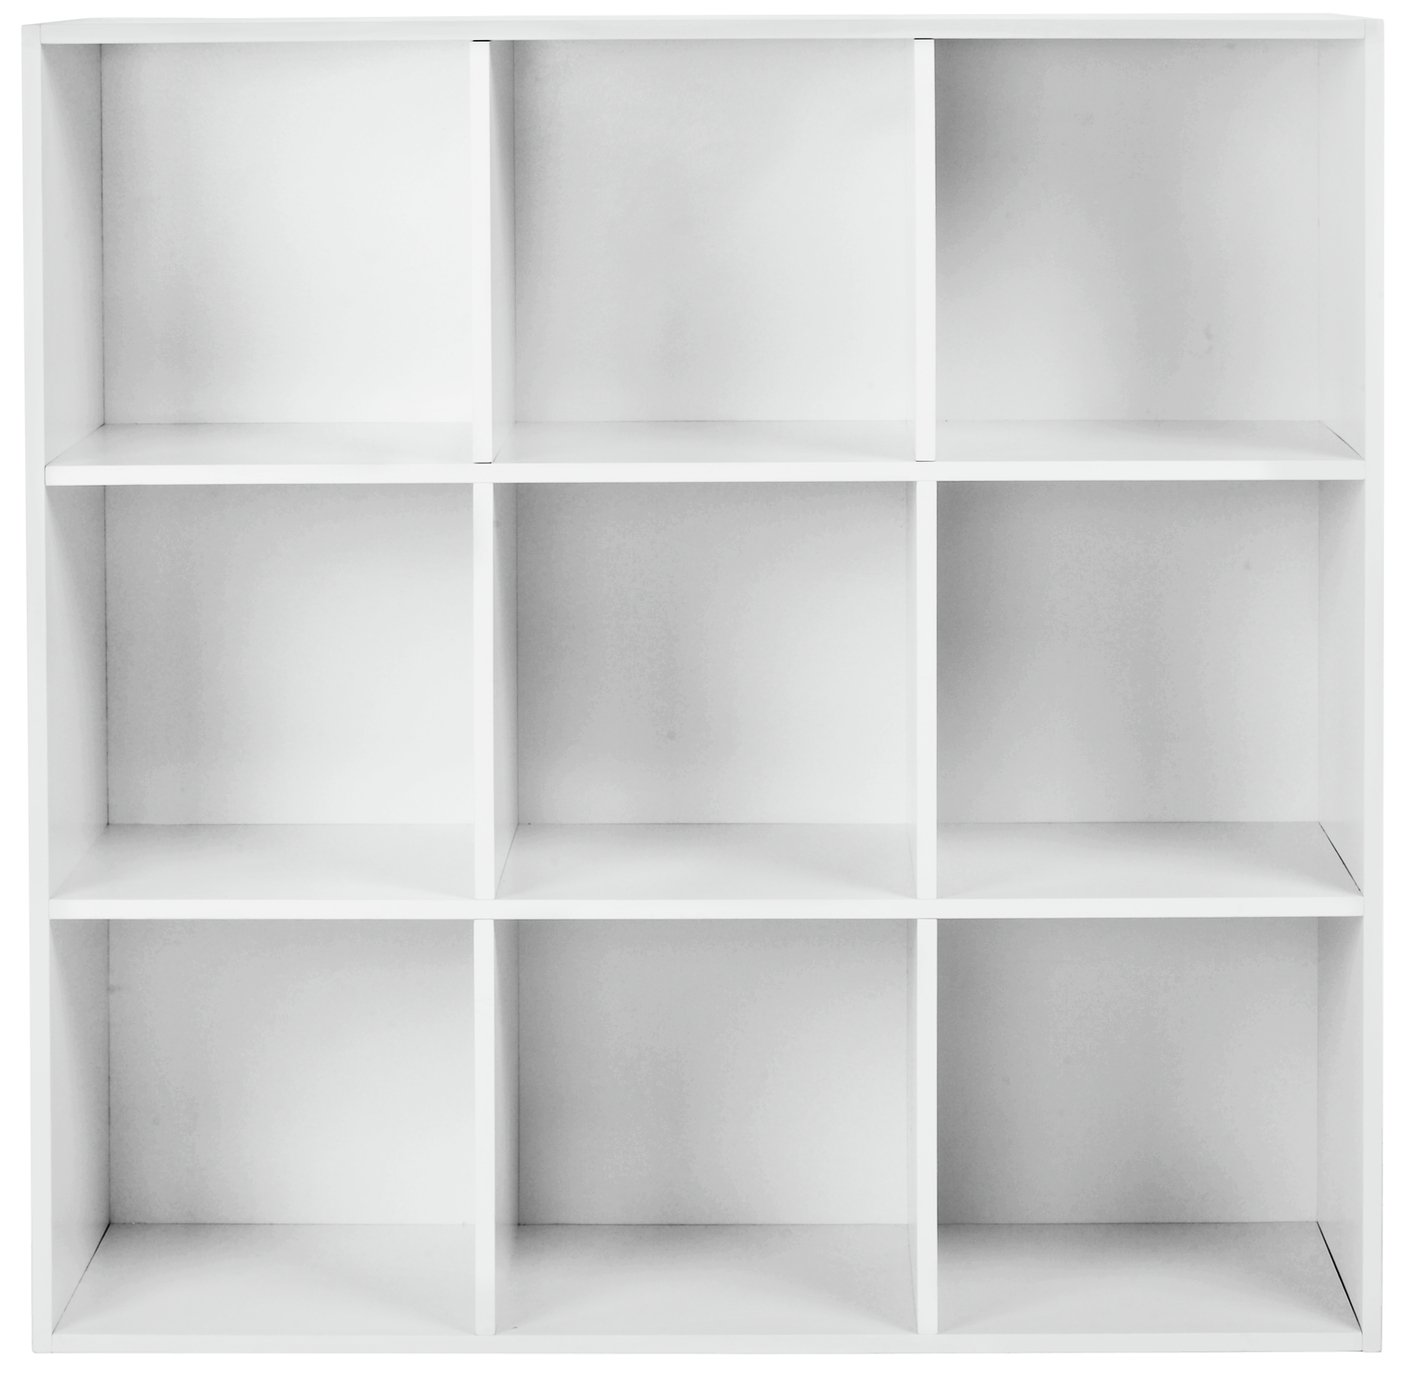 HOME Phoenix 9 Cube - White558/4442